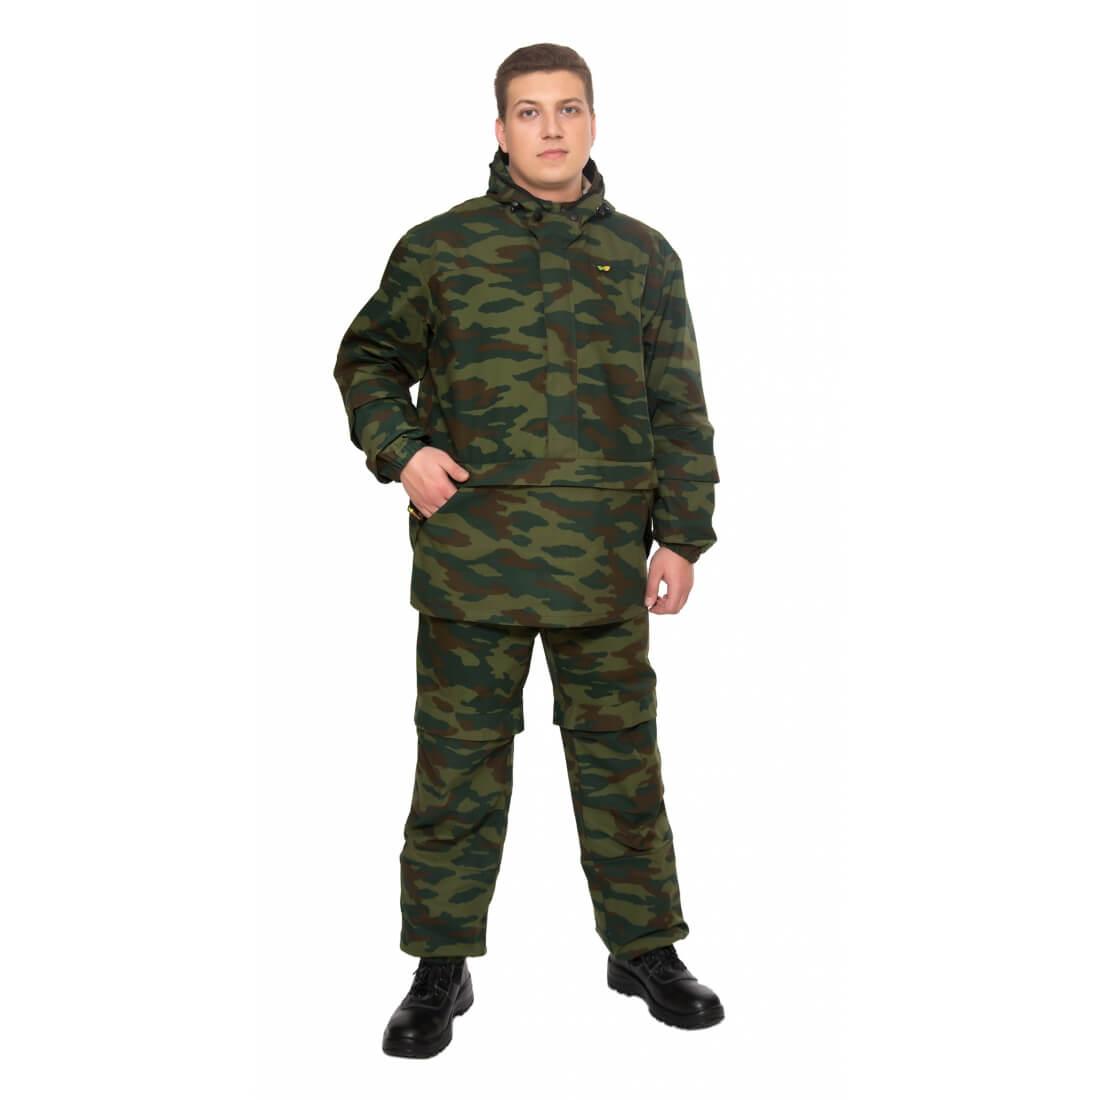 Мужской костюм Биостоп® Лайт